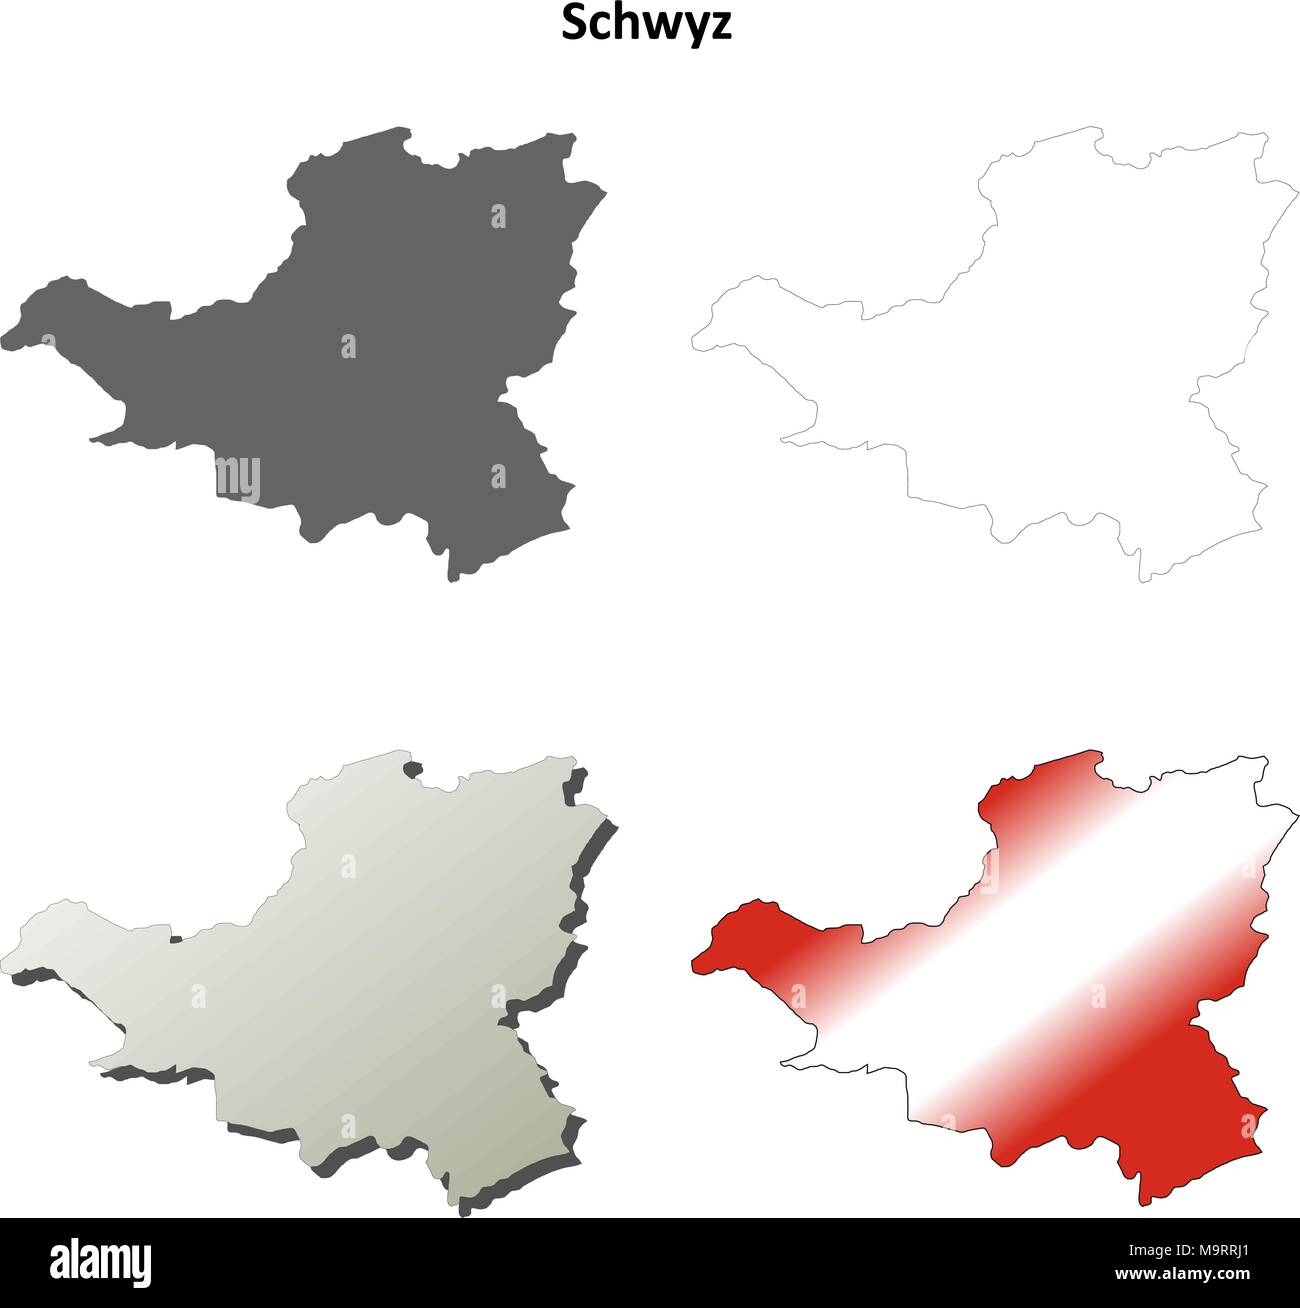 Kanton Schwyz Stock Photos Kanton Schwyz Stock Images Alamy